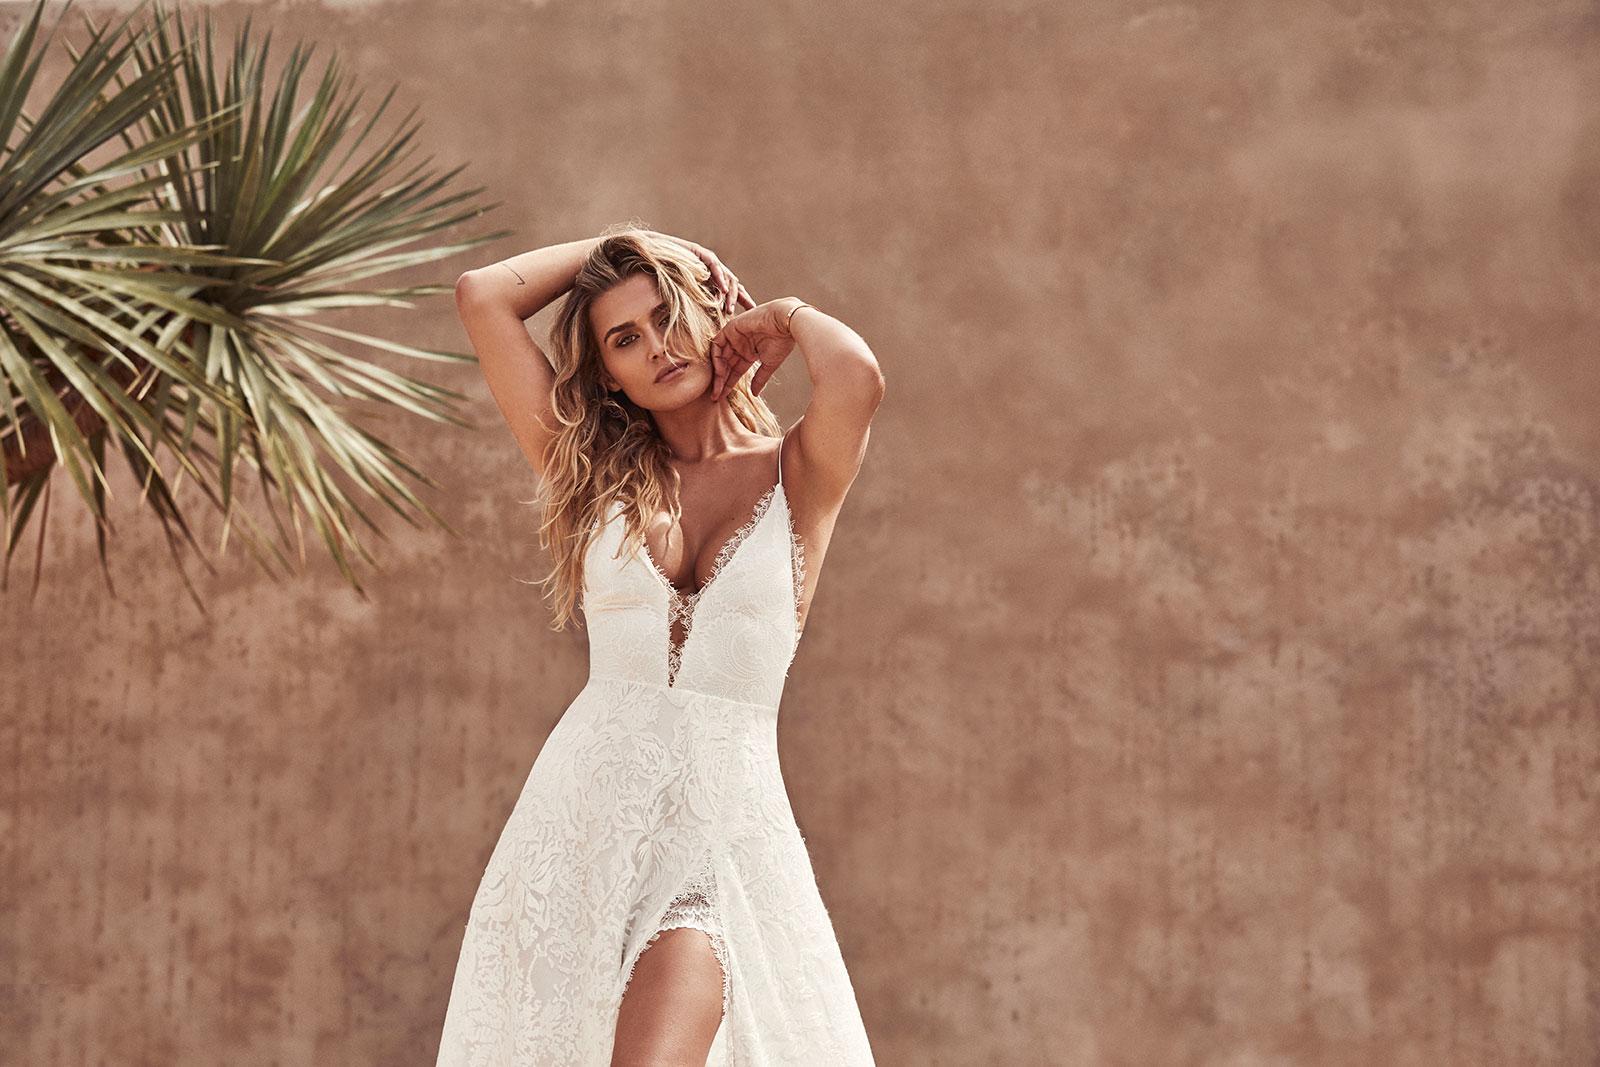 GRACE LOVES LACE Darling wedding dress | Wedding Dresses under $5,000 | LOVE FIND CO. Bridal Dress Directory